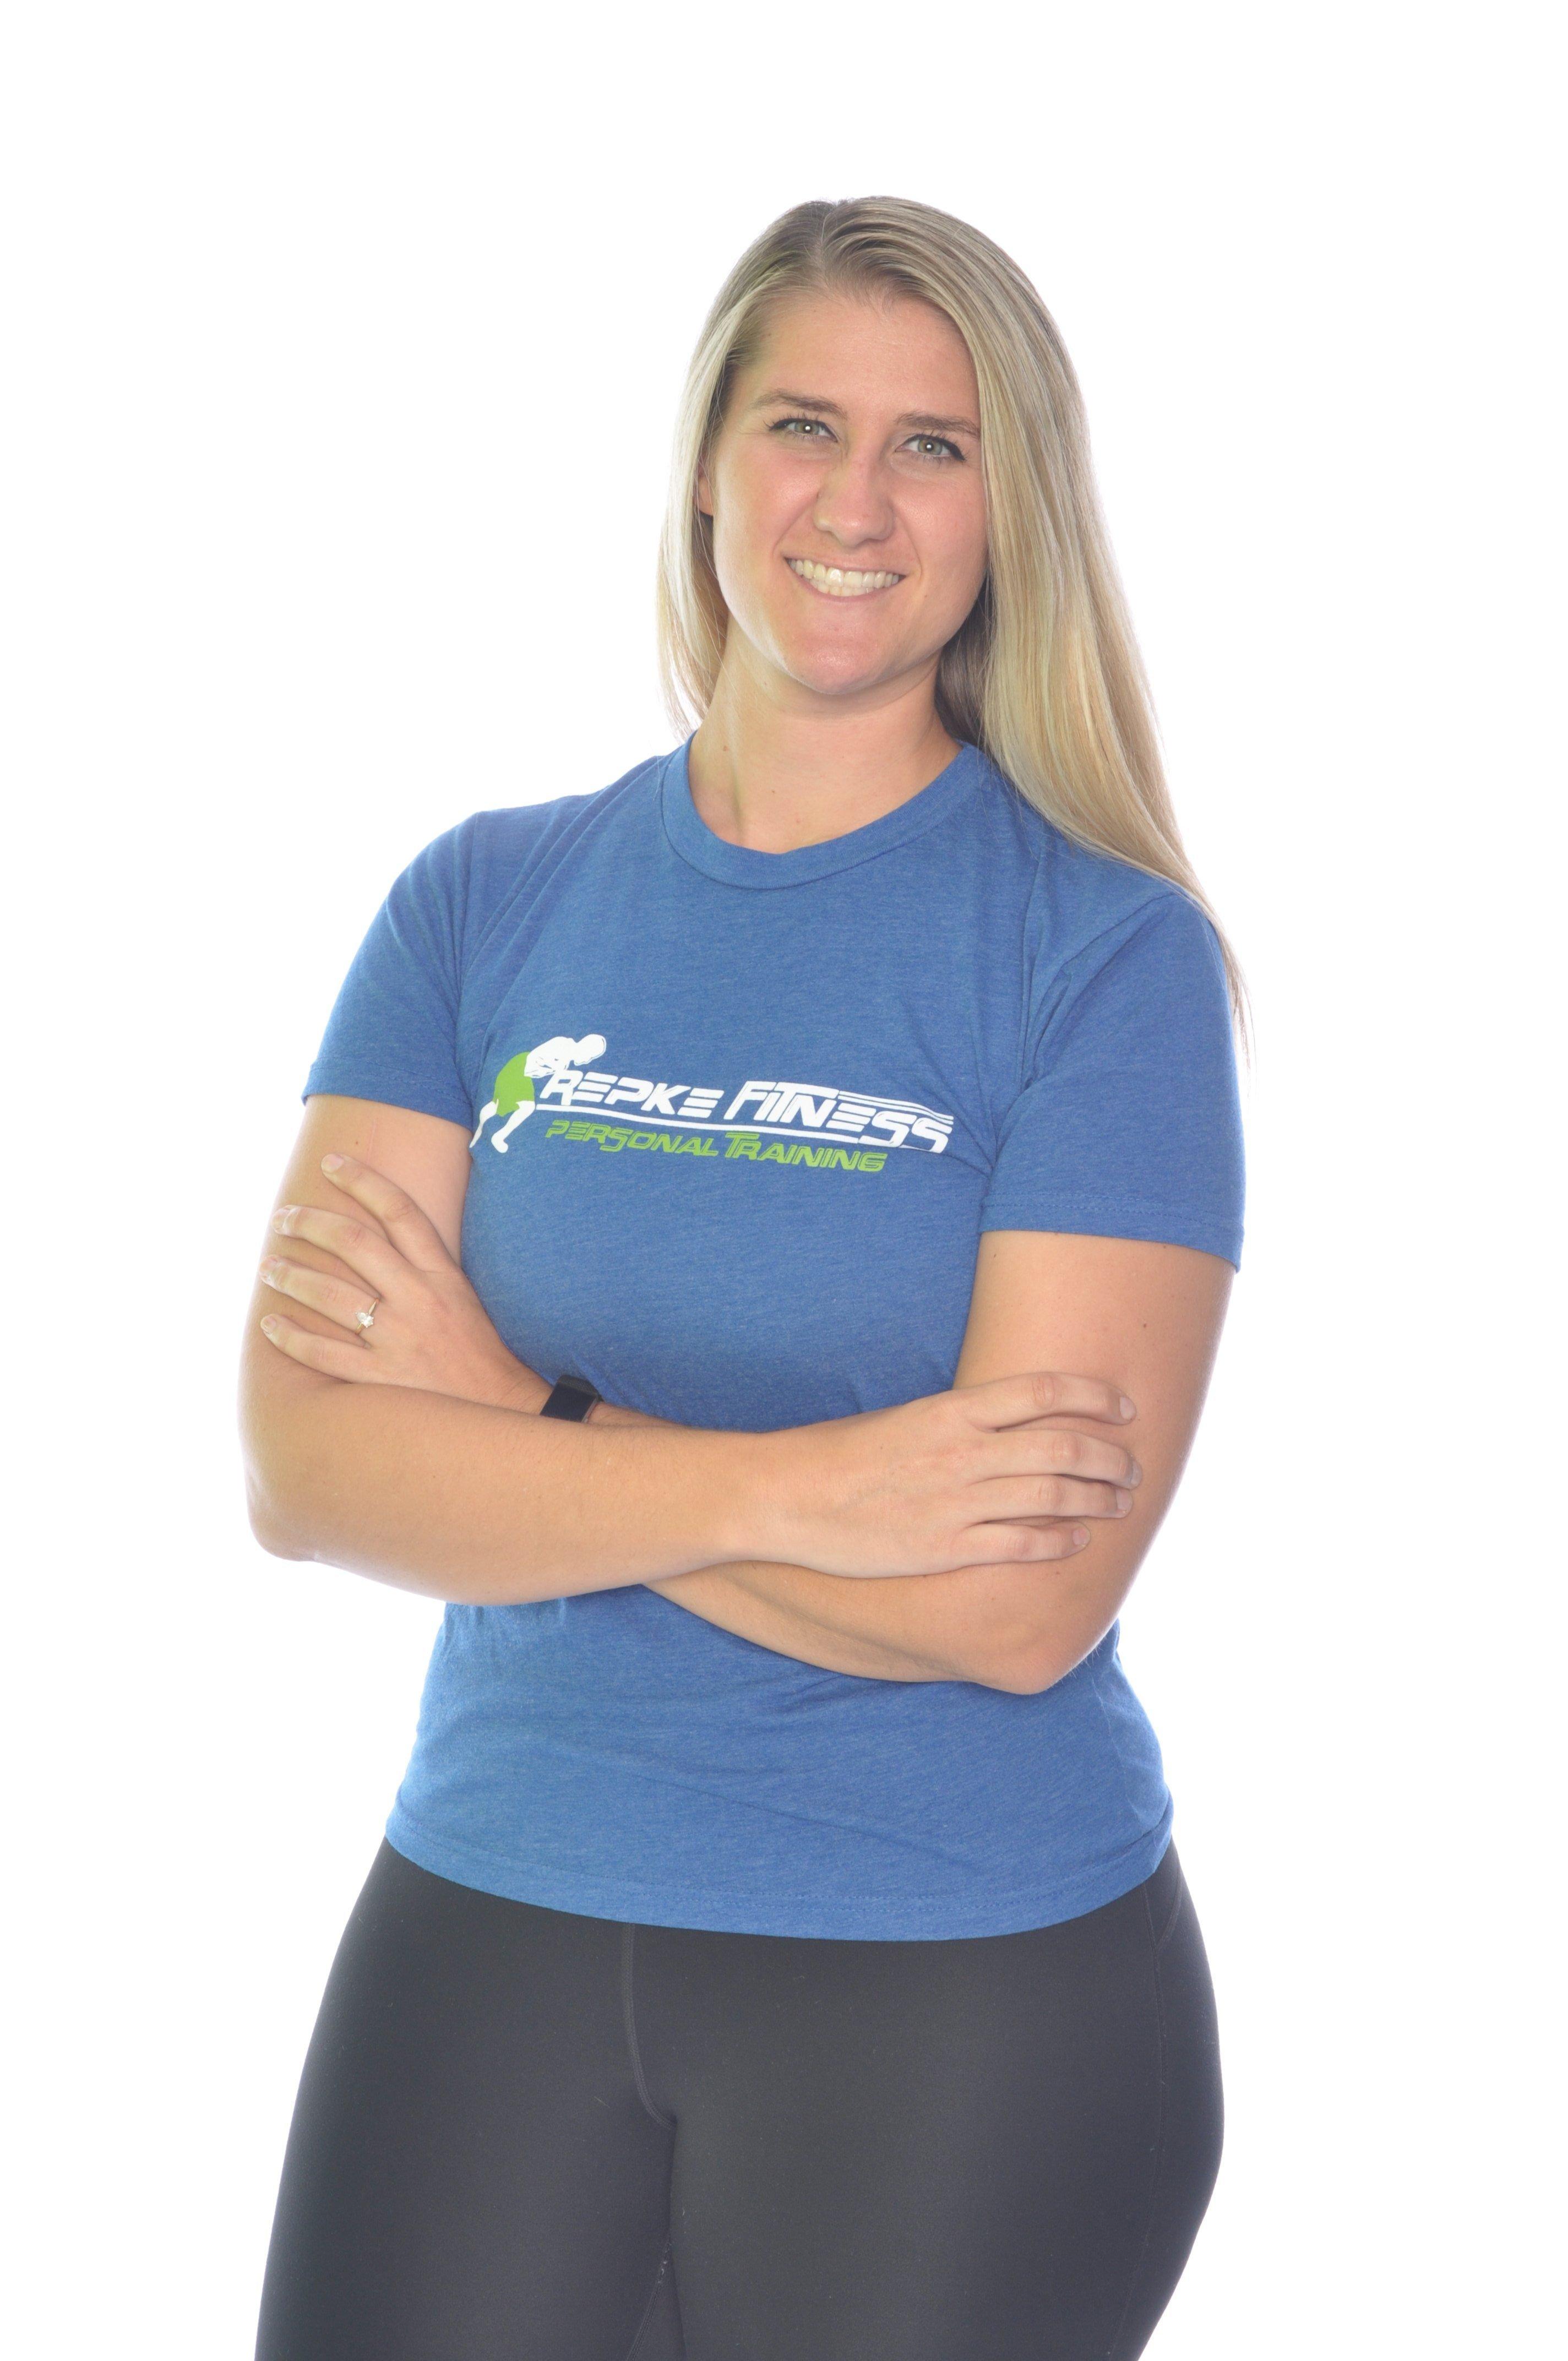 Louben Repke Certified Personal Trainer in Severna Park